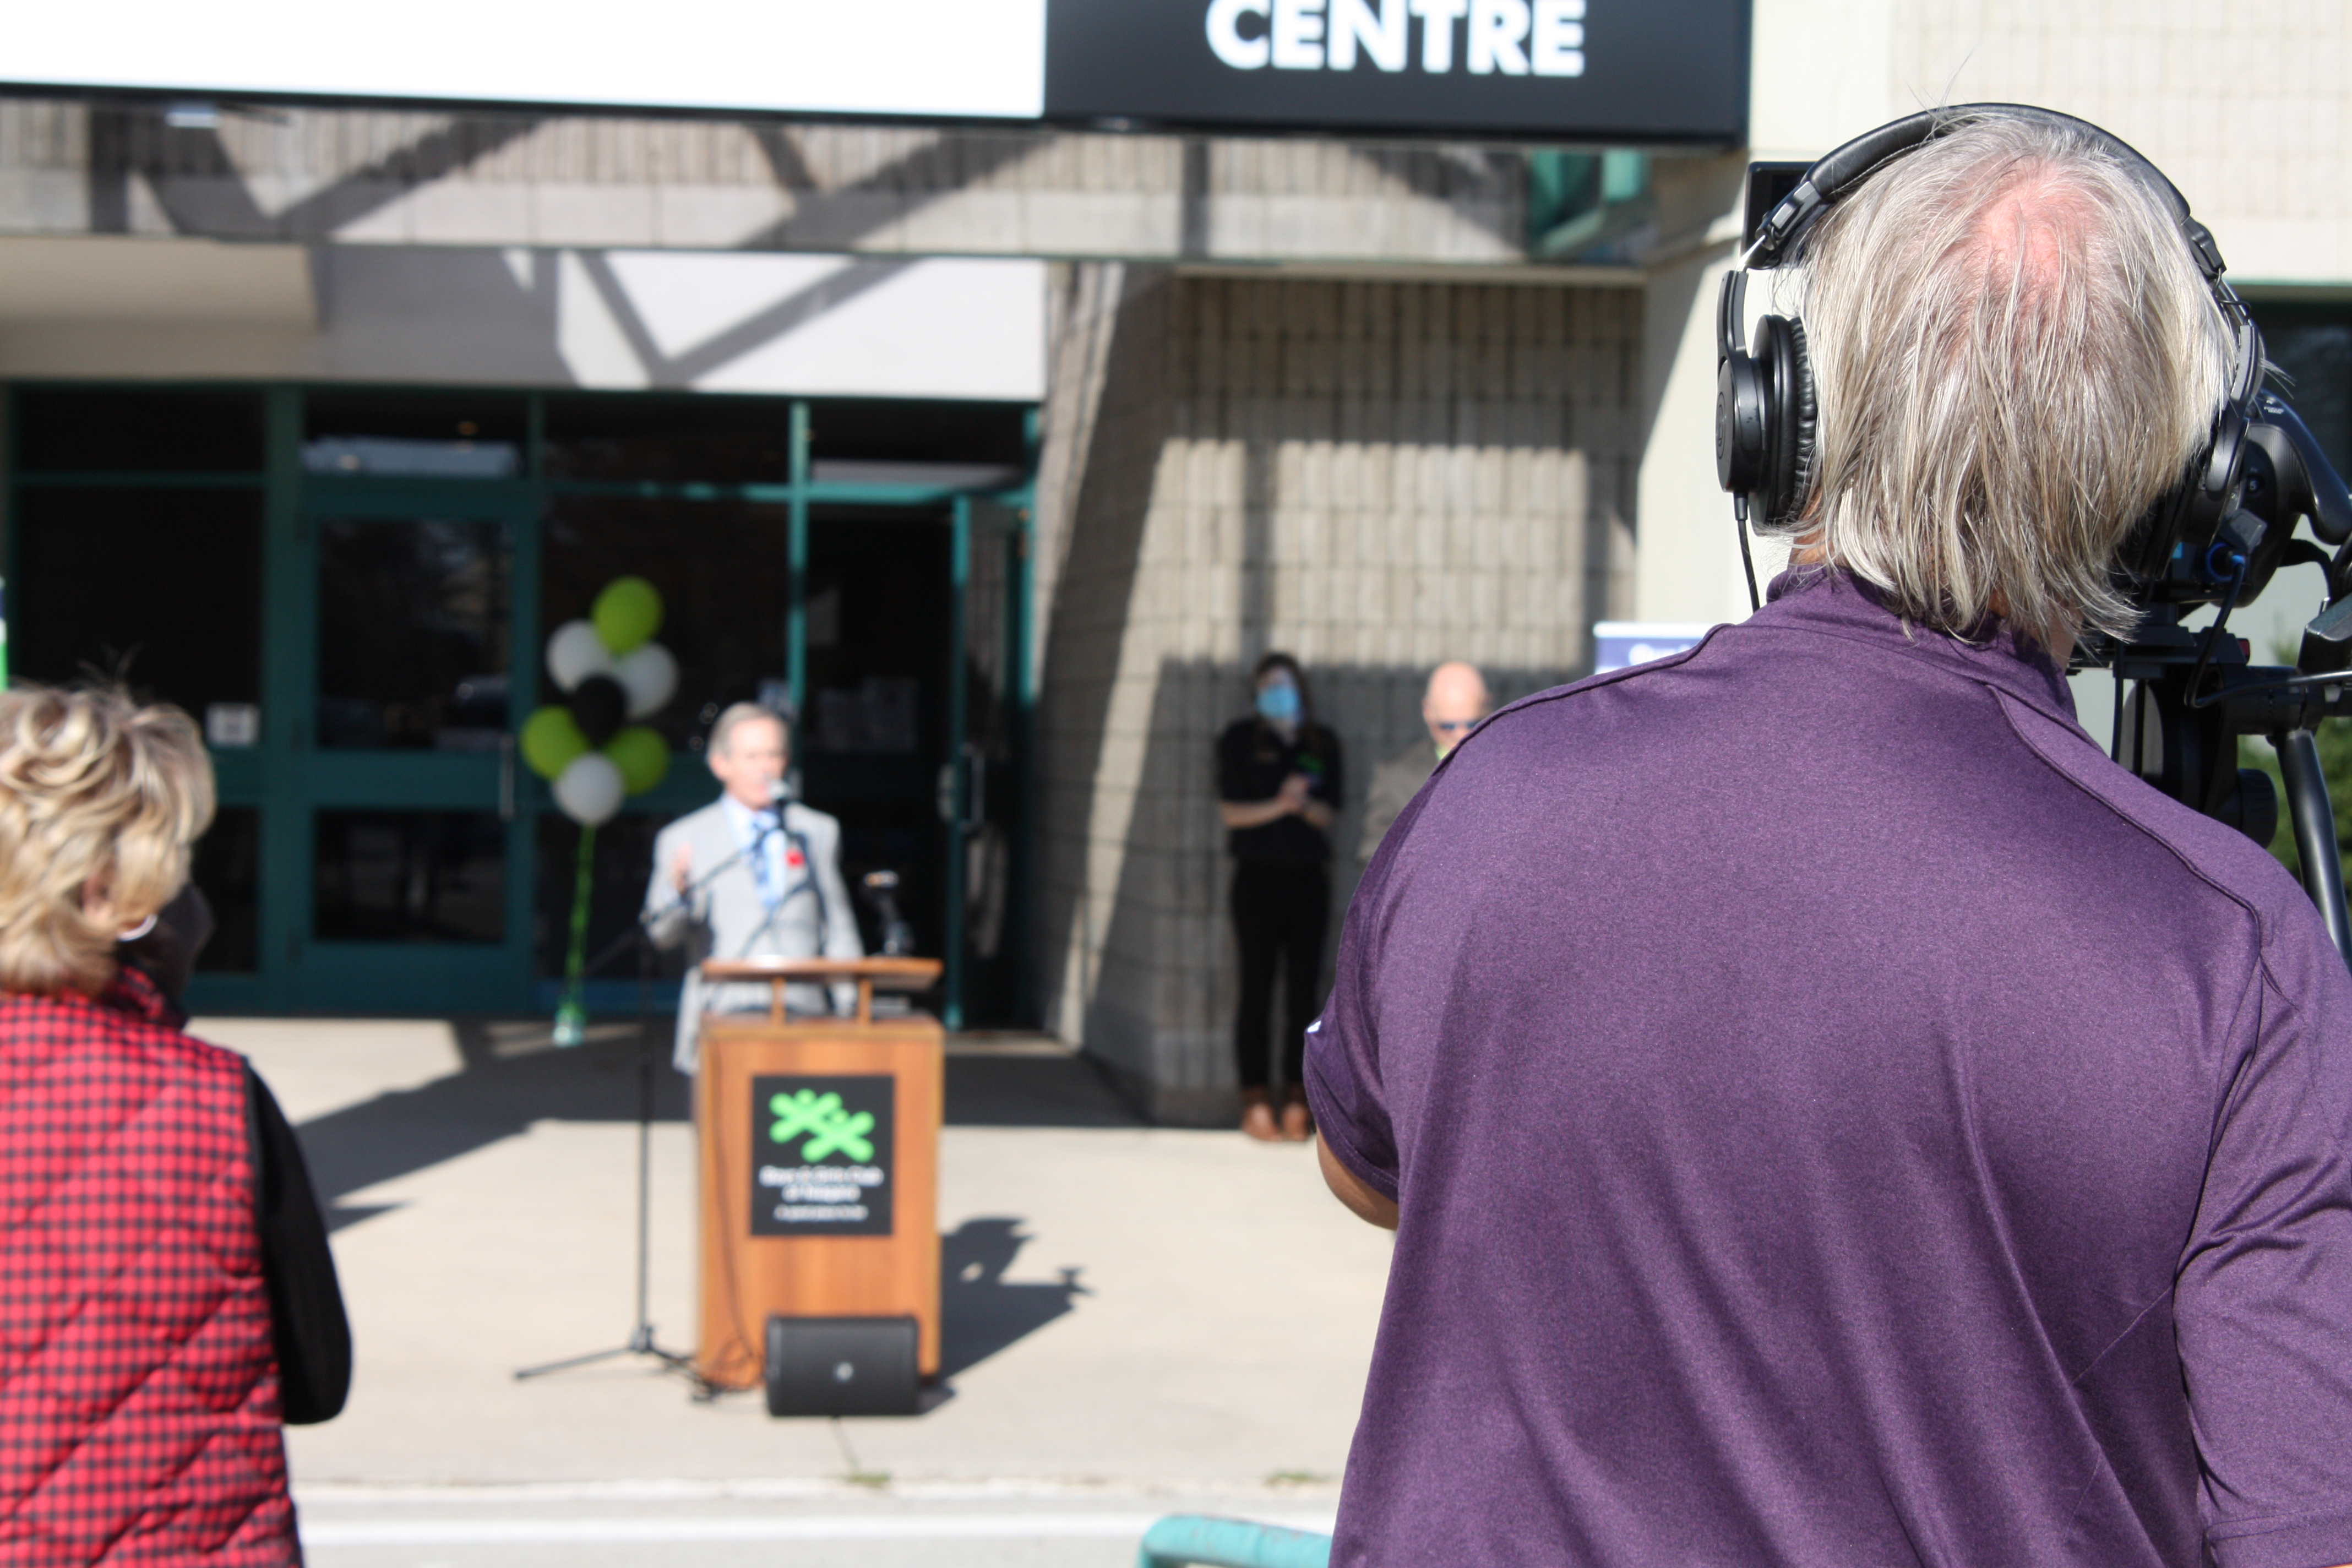 Wayne Redekop at podium for EJ Freeland ribbon cutting ceremony